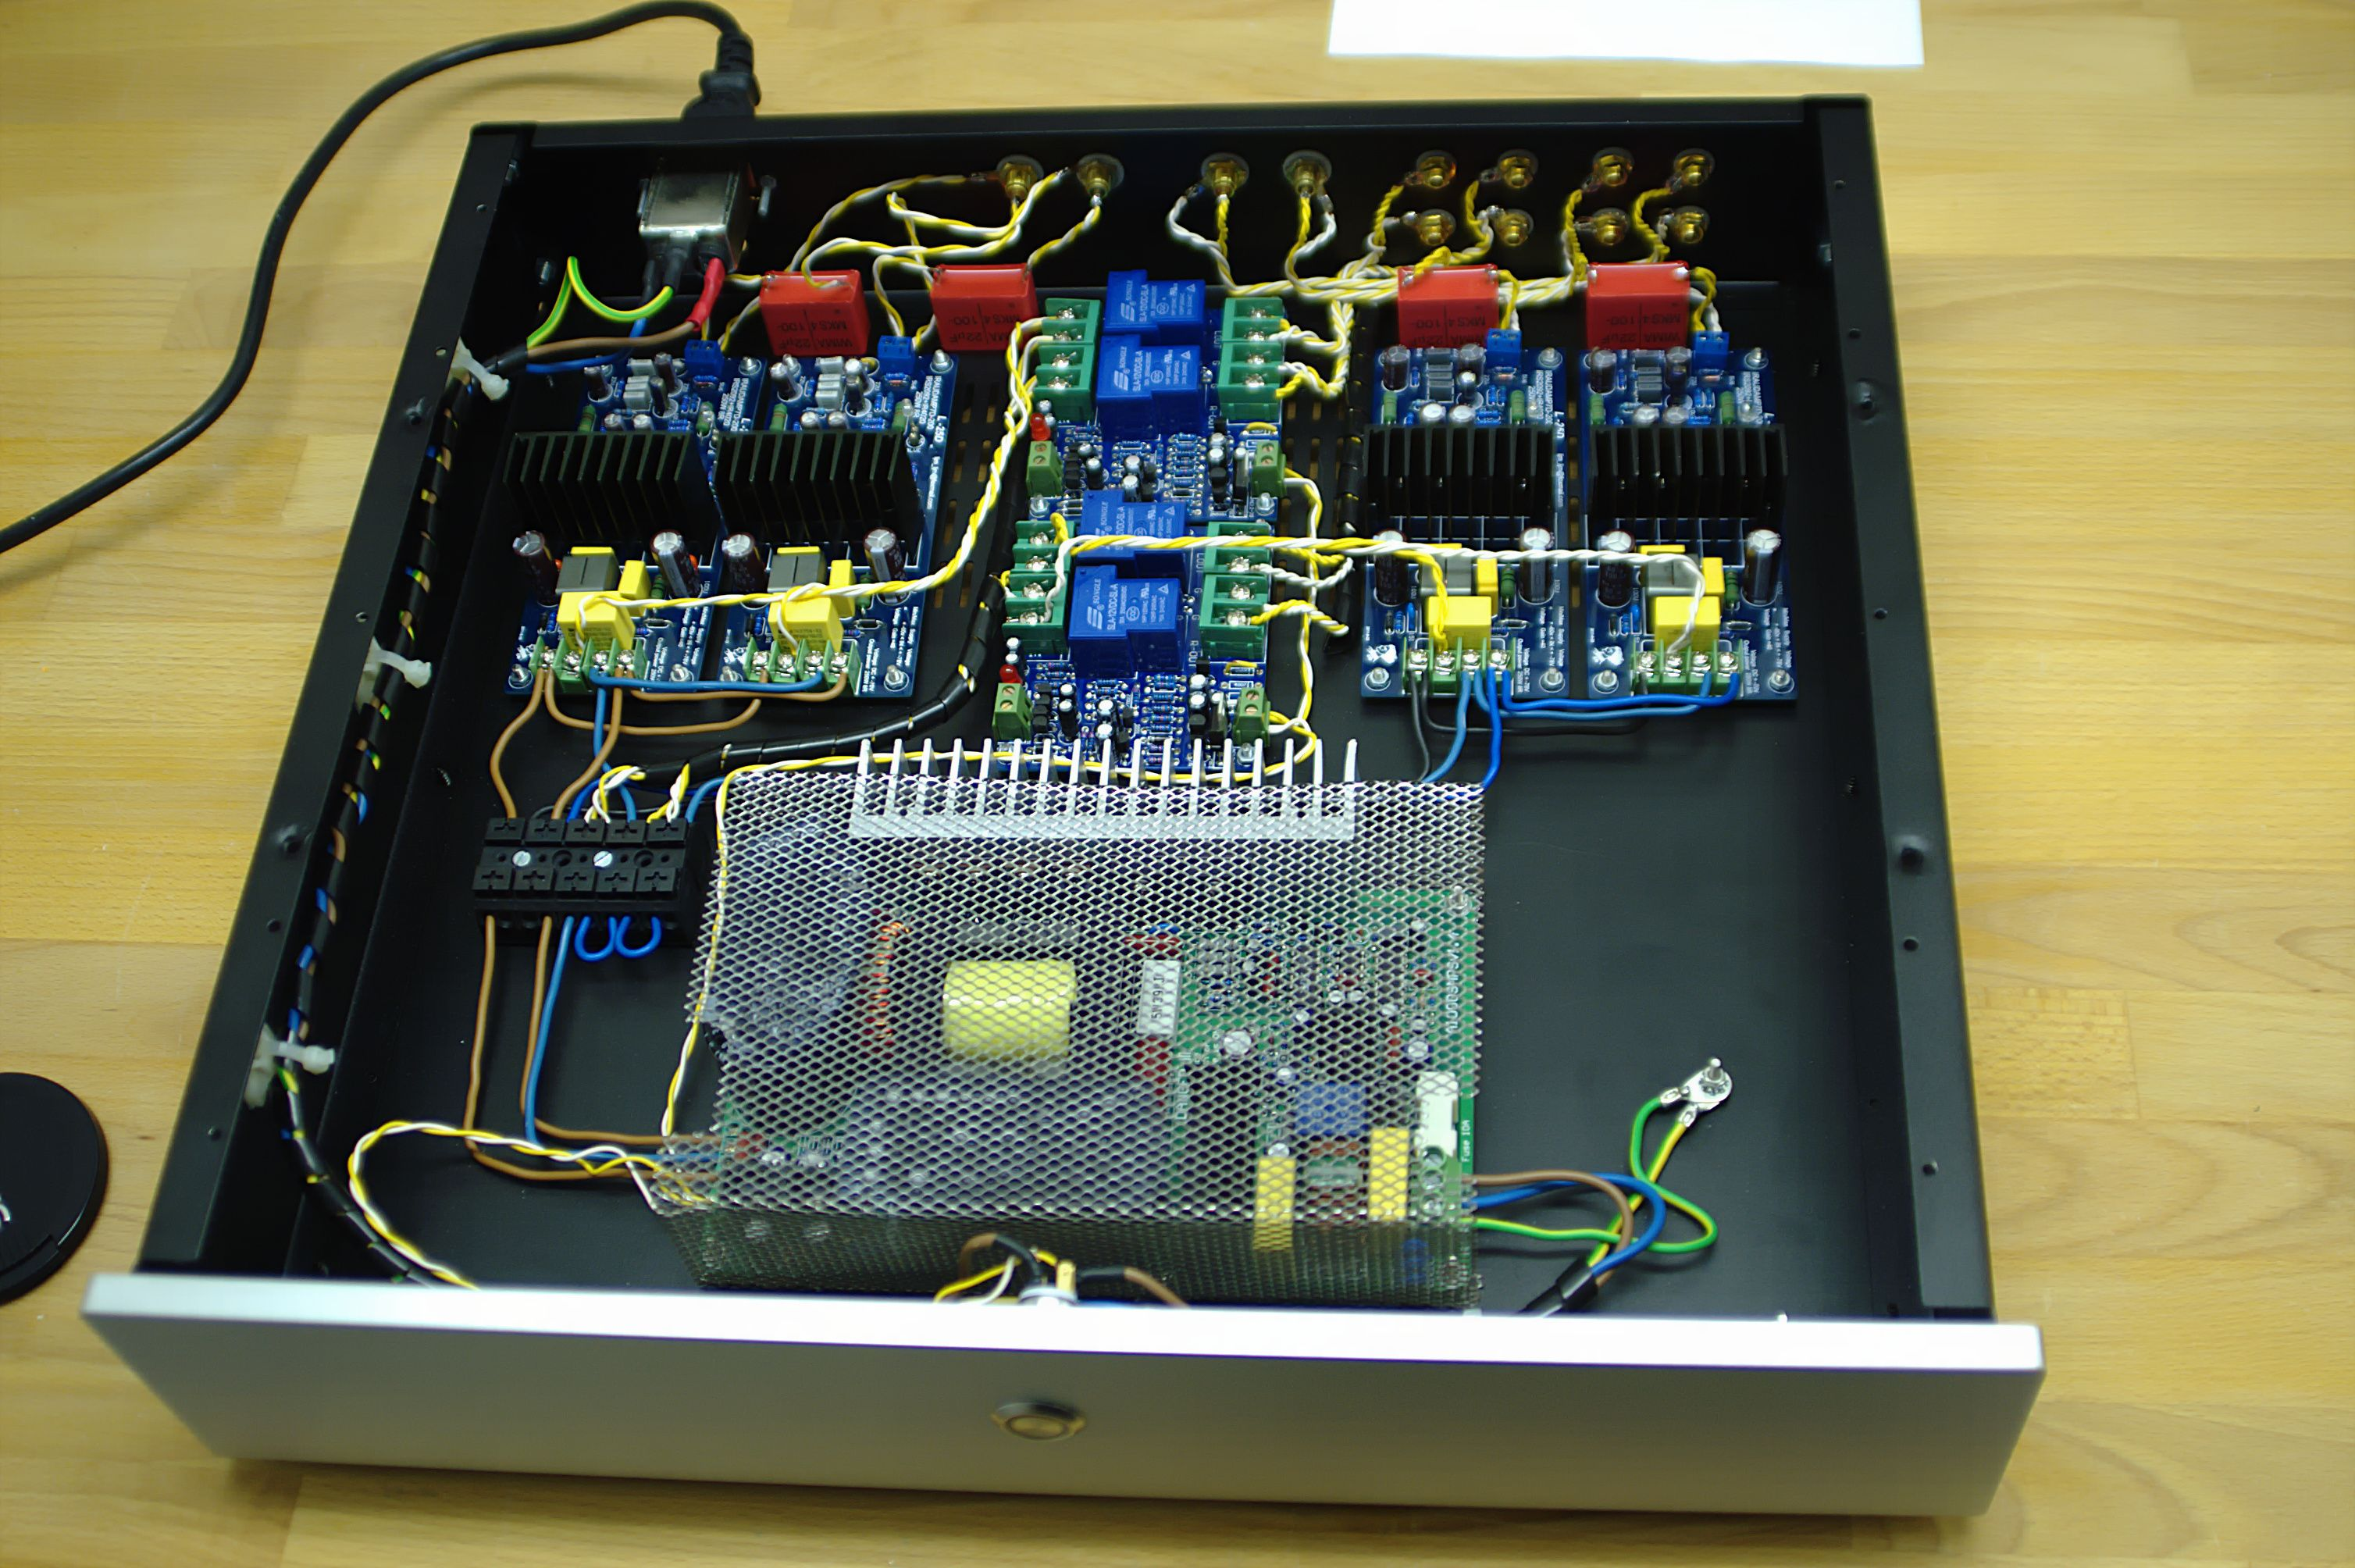 4 Kanal L25d Hifi Pinterest Amp Audio And Cool Stuff Pass Labs Aleph2 Diy Amplifier Kkpcb Layout Digital Listening To Music Speakers Boxing